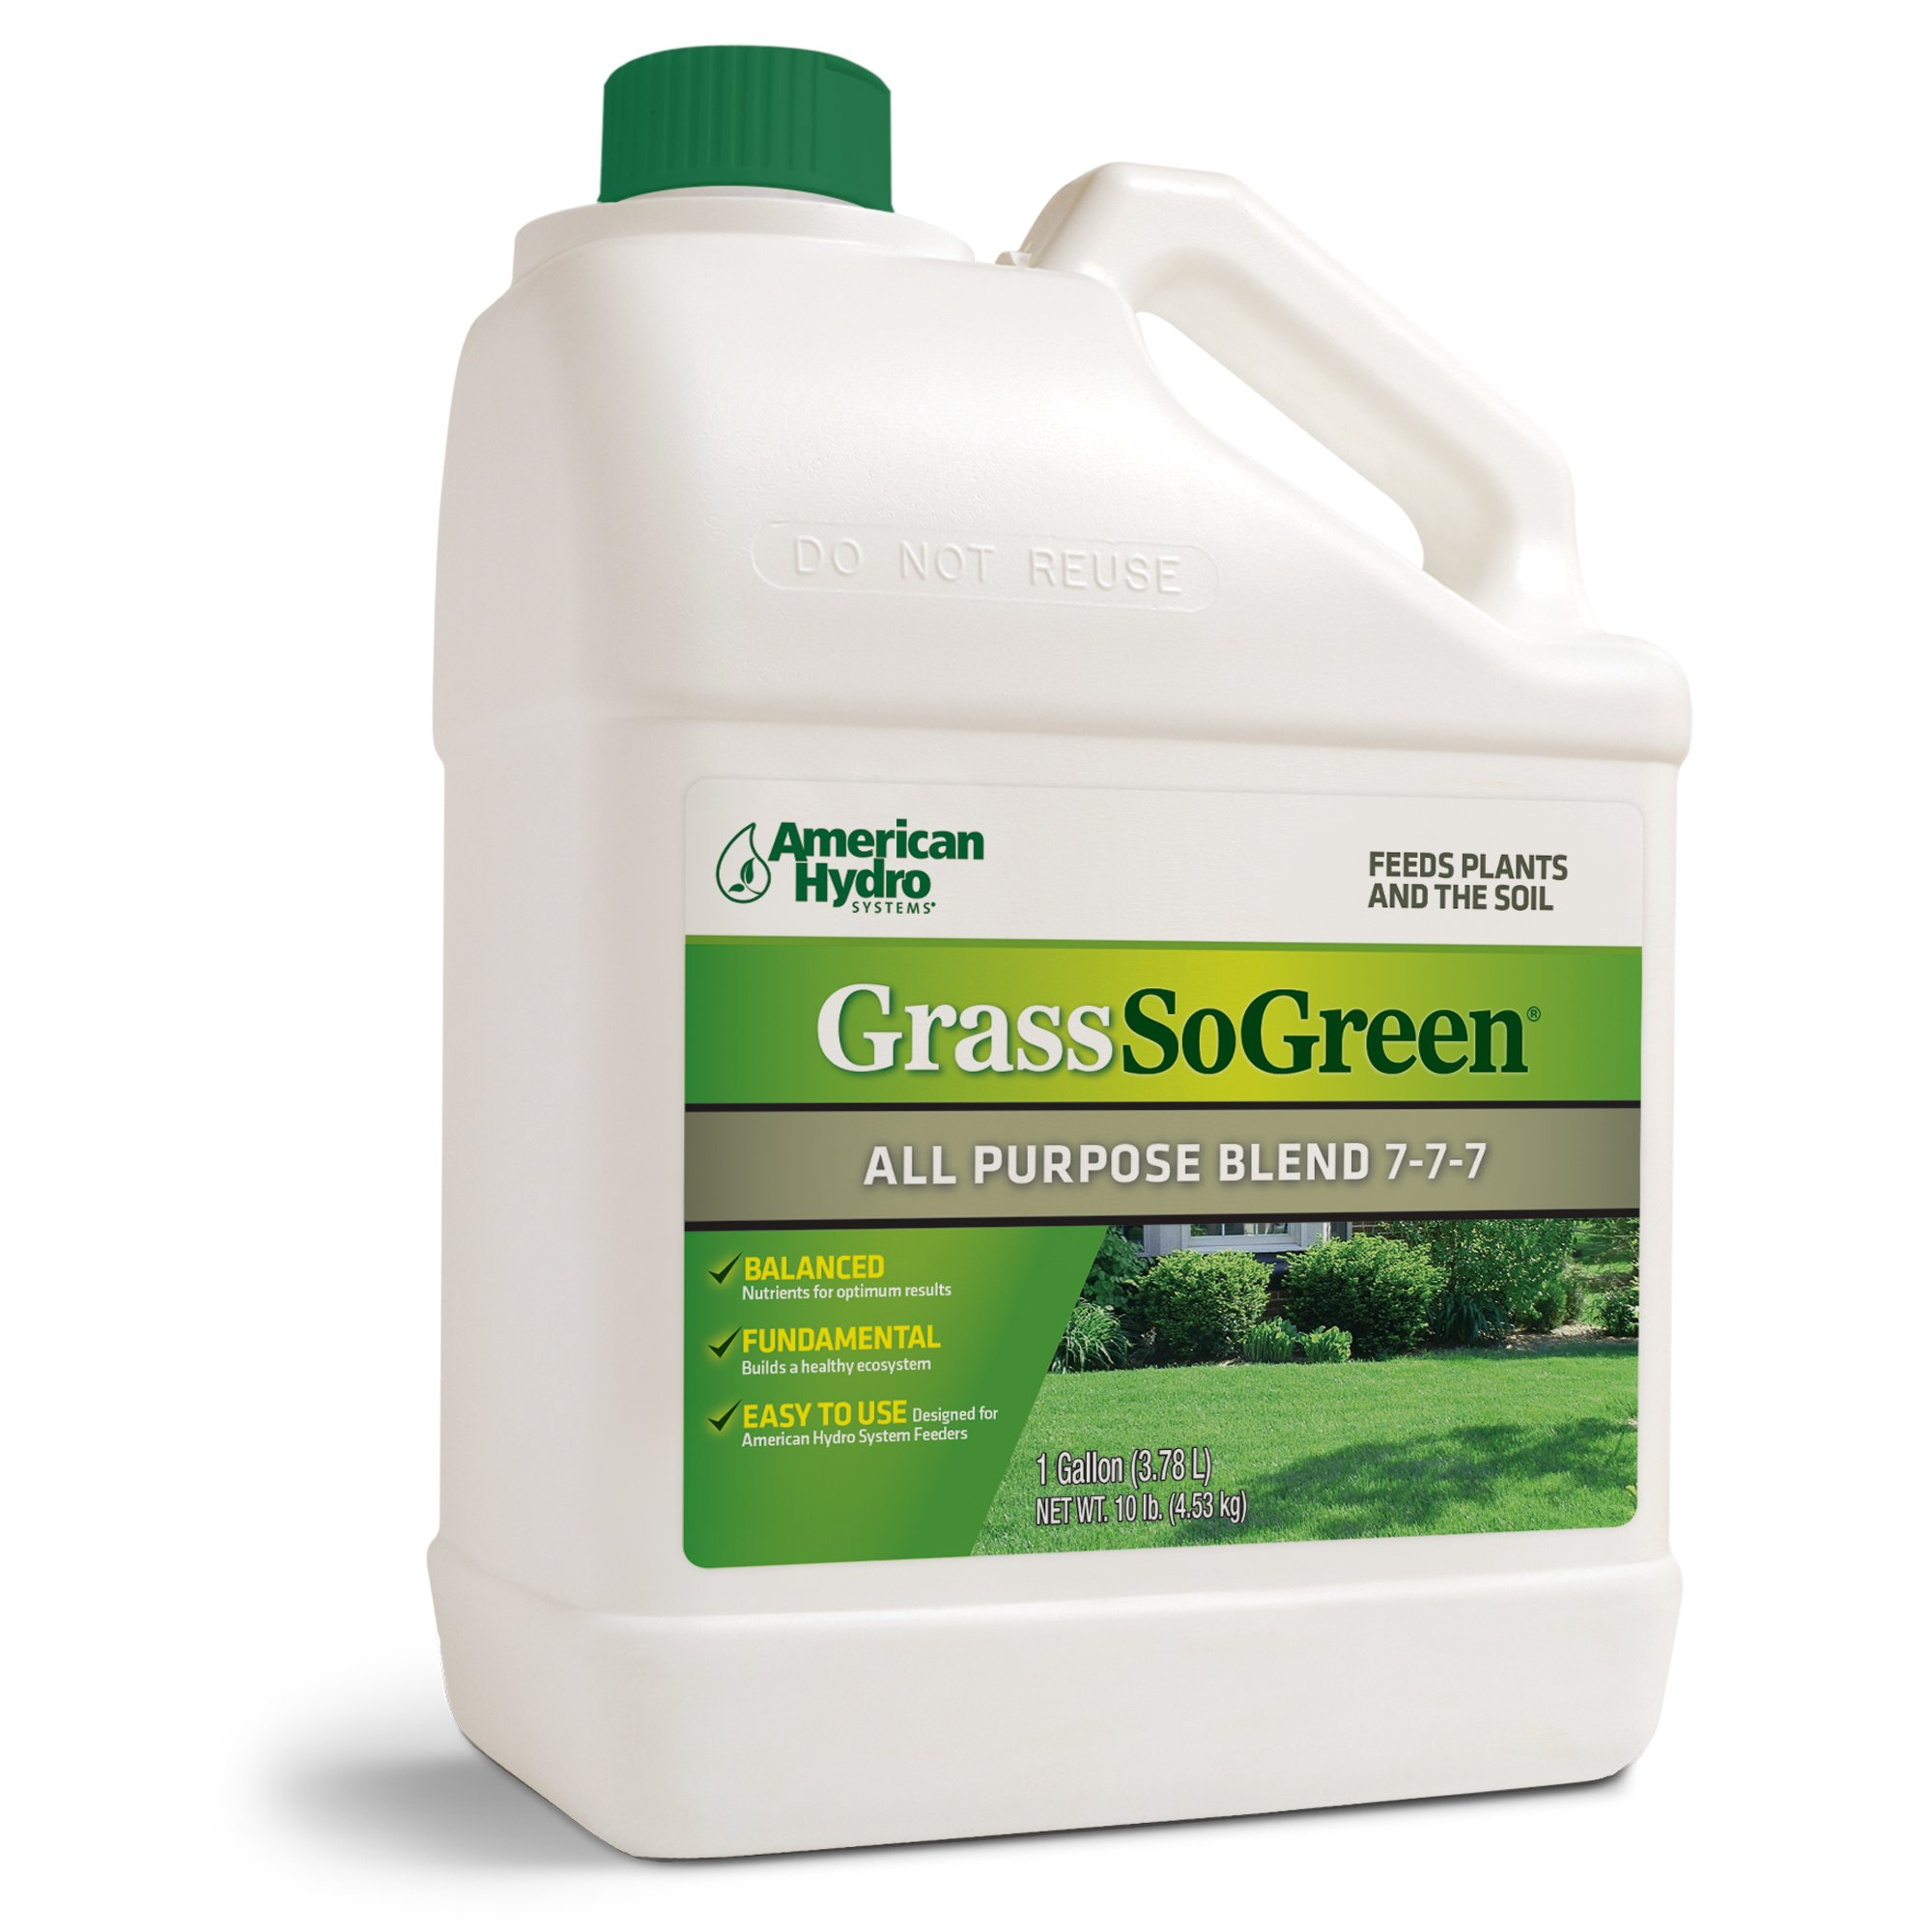 Grass So Green 7-7-7 F4G Formula is an Environmentally-Friendly Liquid Fertilizer that is Applied Through an American Hydro Systems Feeder System in Continuous, Small Doses. by American Hydro Systems